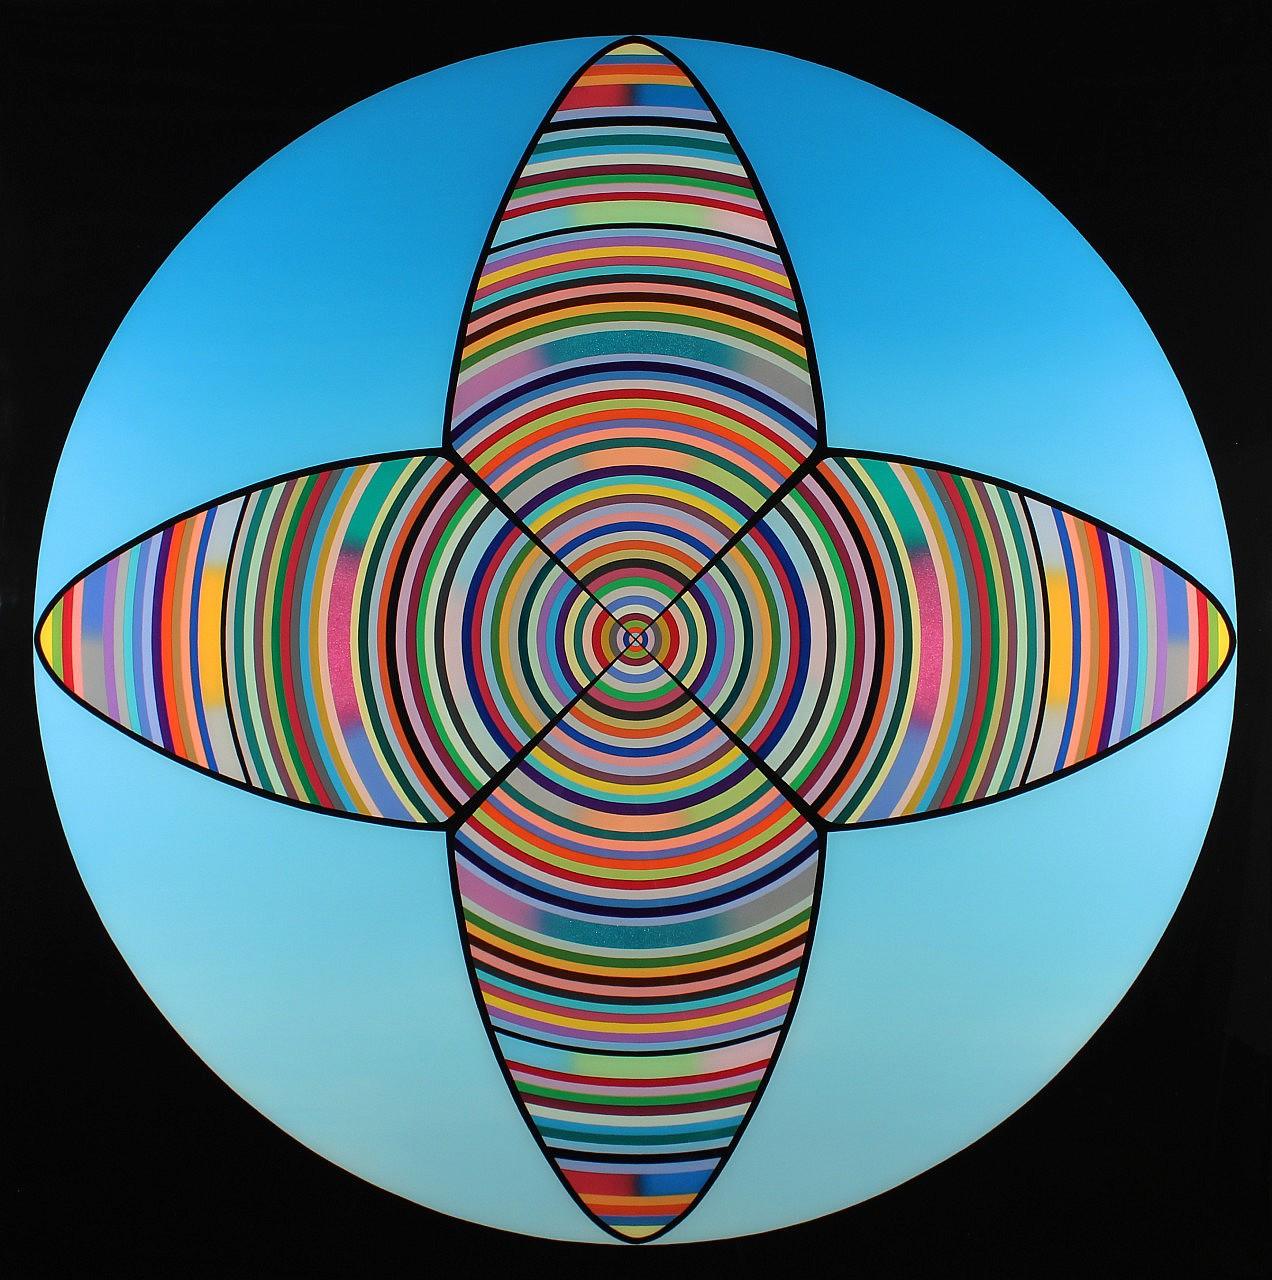 4 Fold Rotational Symmetry